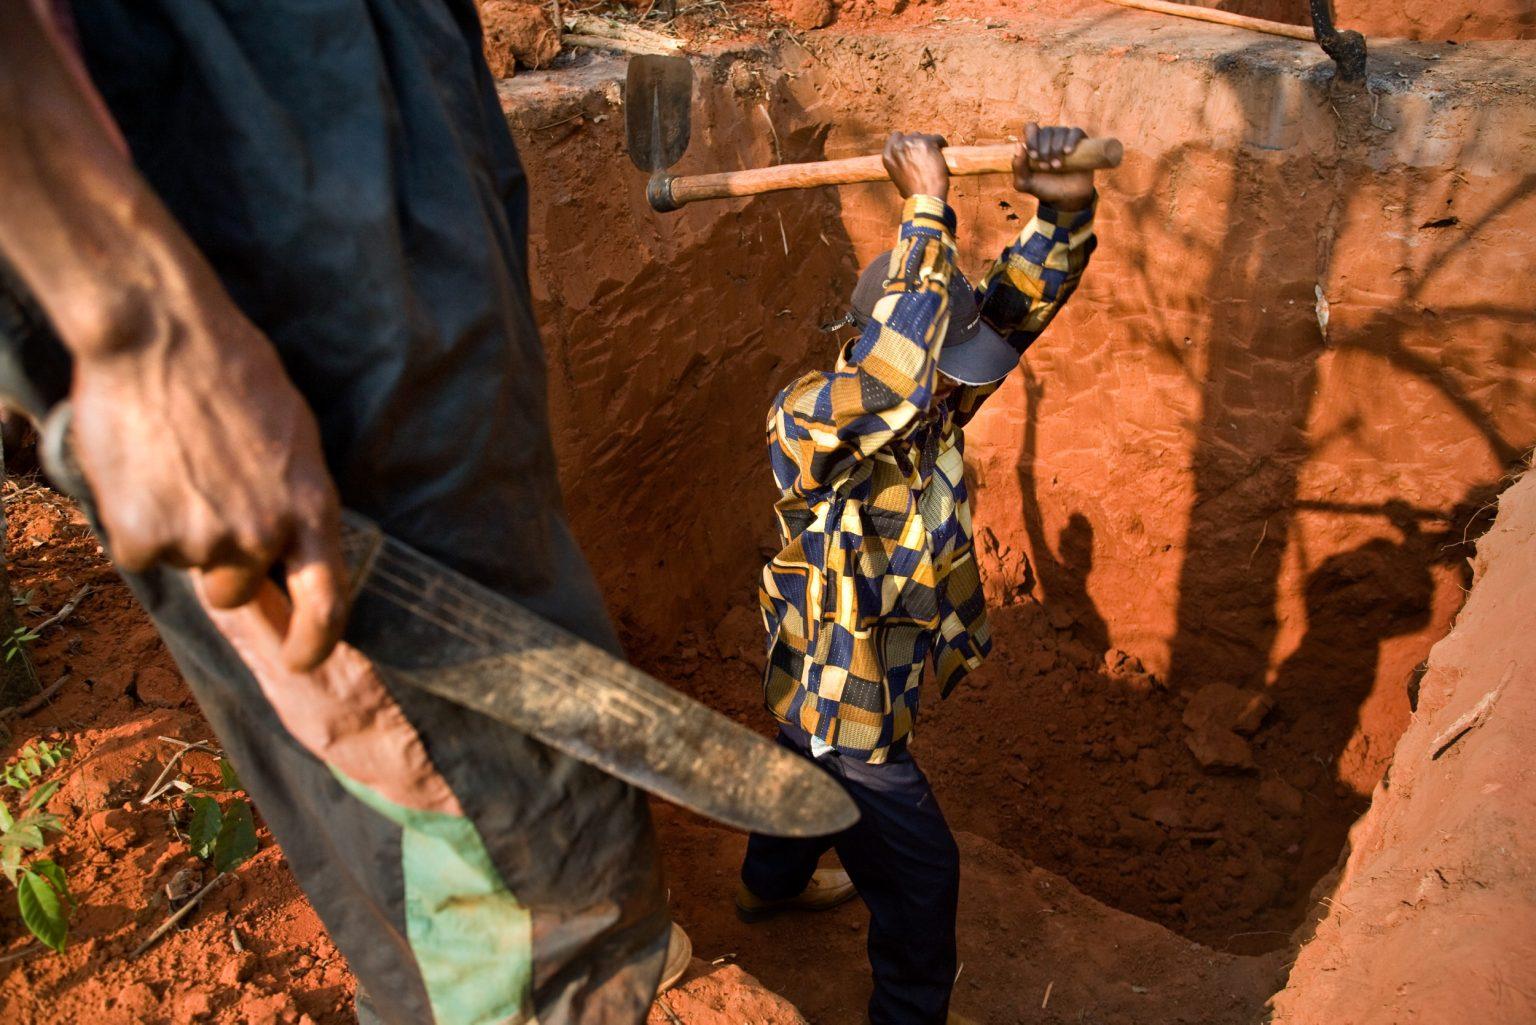 Coltan miners. vKatanga, Carriére Kisengo, Democratic Republic of the Congo, 2008